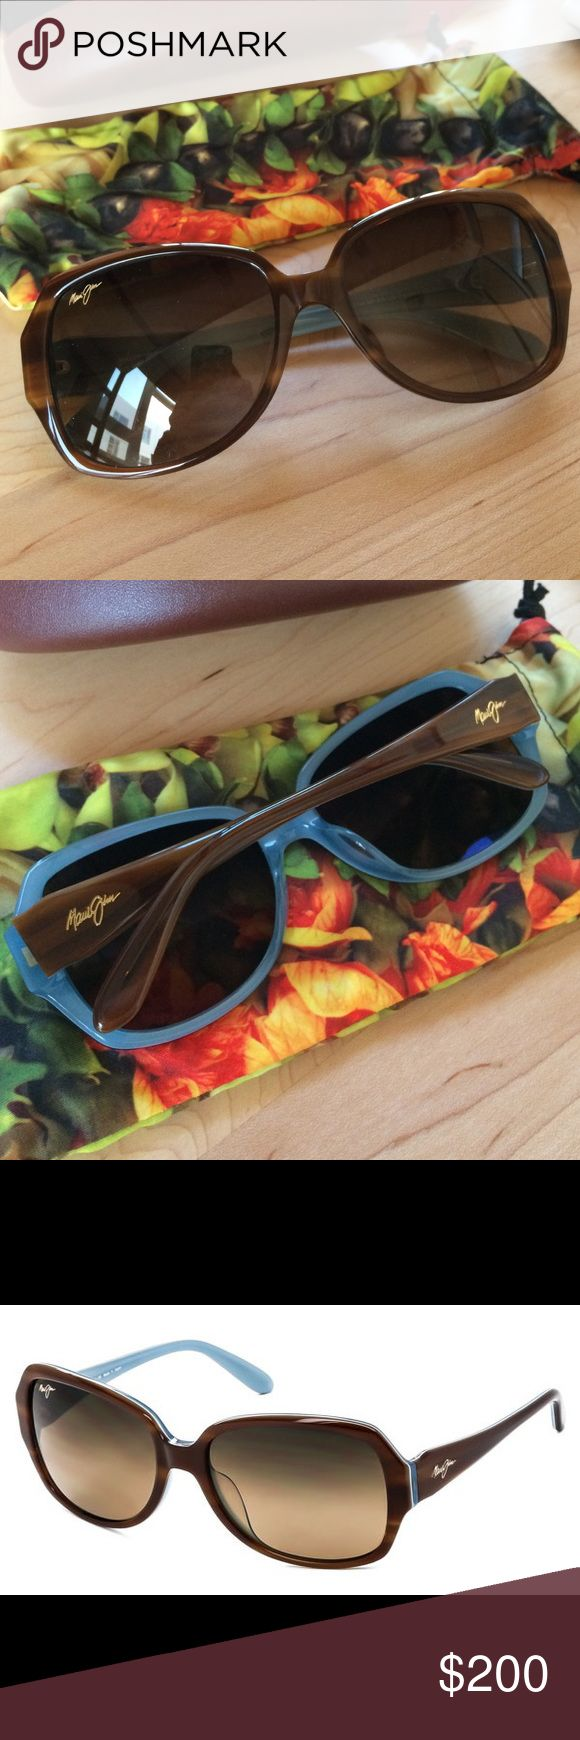 Polarized Maui Jim's Kalena Brand new polarized Maui Jims. Includes a hard case and a reversible cloth pouch Maui Jim Accessories Sunglasses